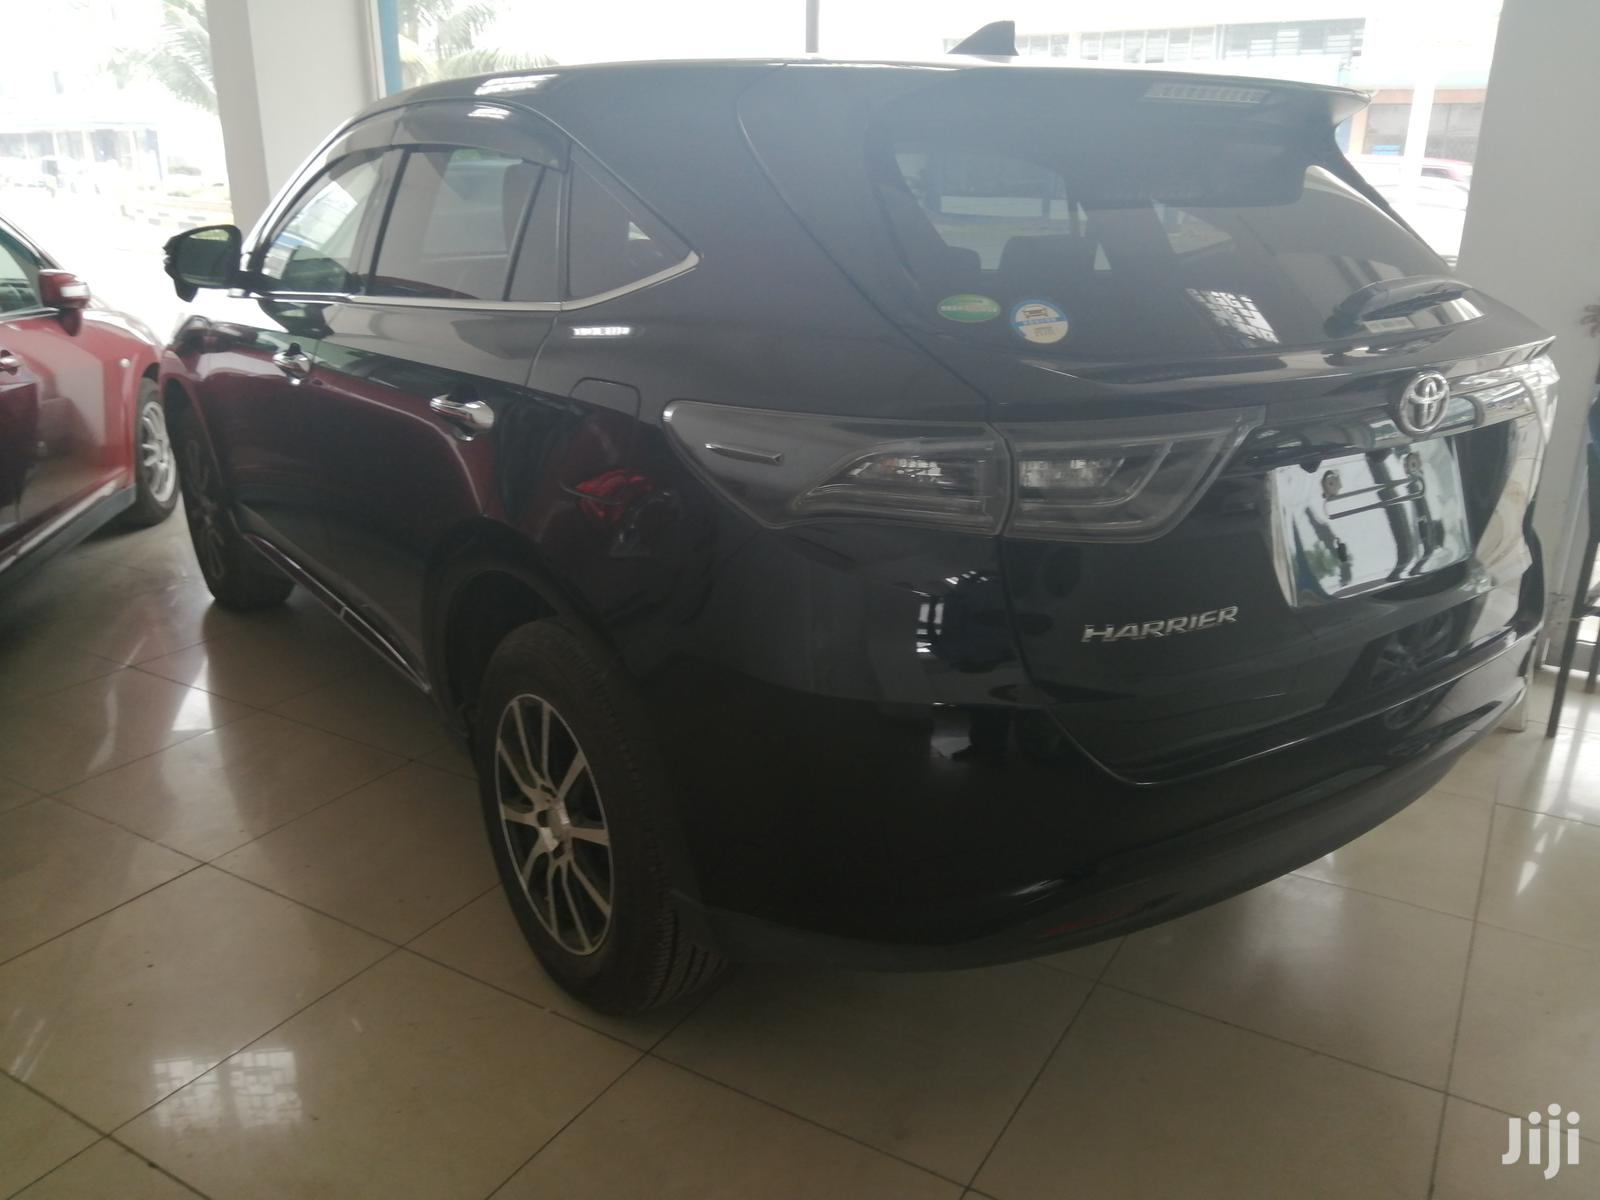 Toyota Harrier 2012 Black | Cars for sale in Mvita, Mombasa, Kenya